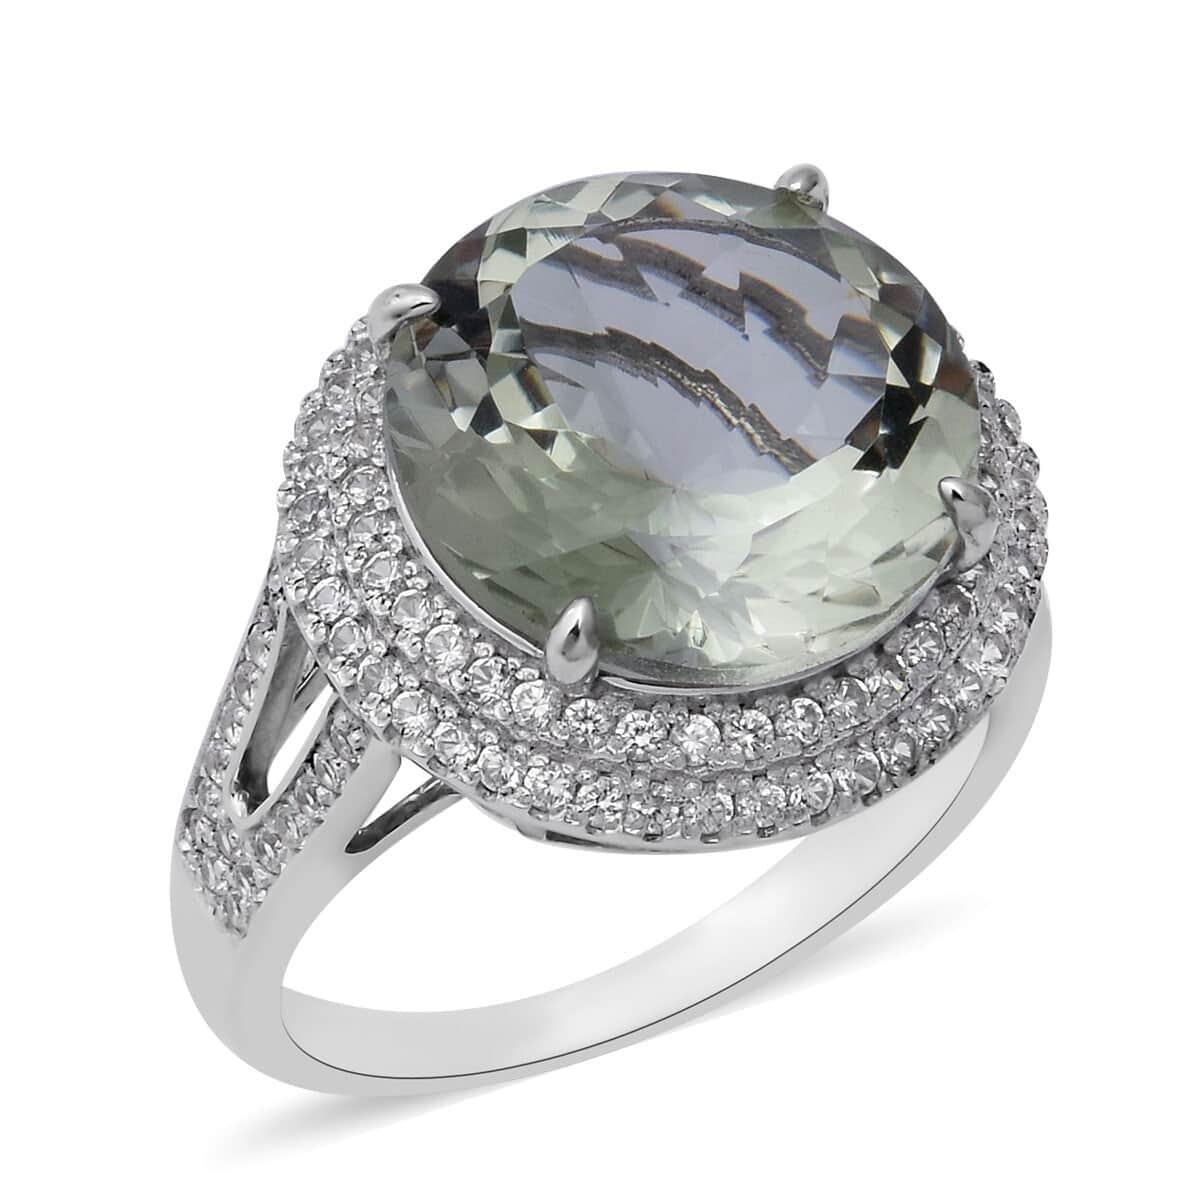 Green Amethyst with Cubic Zircon 925 Sterling Silver Split Shank Ring